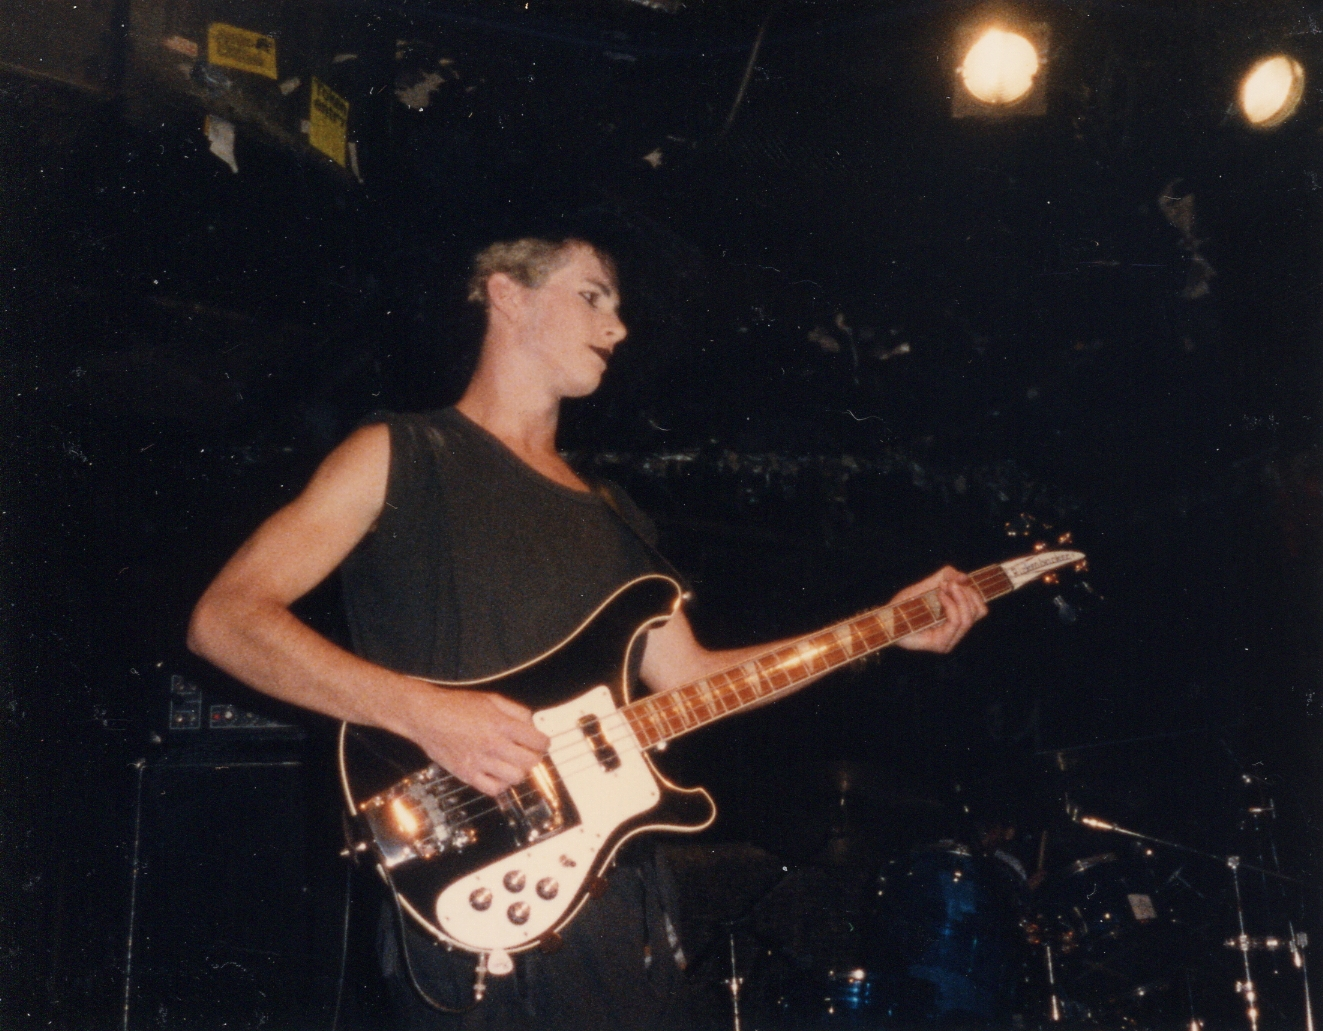 1985-08-12 (15)